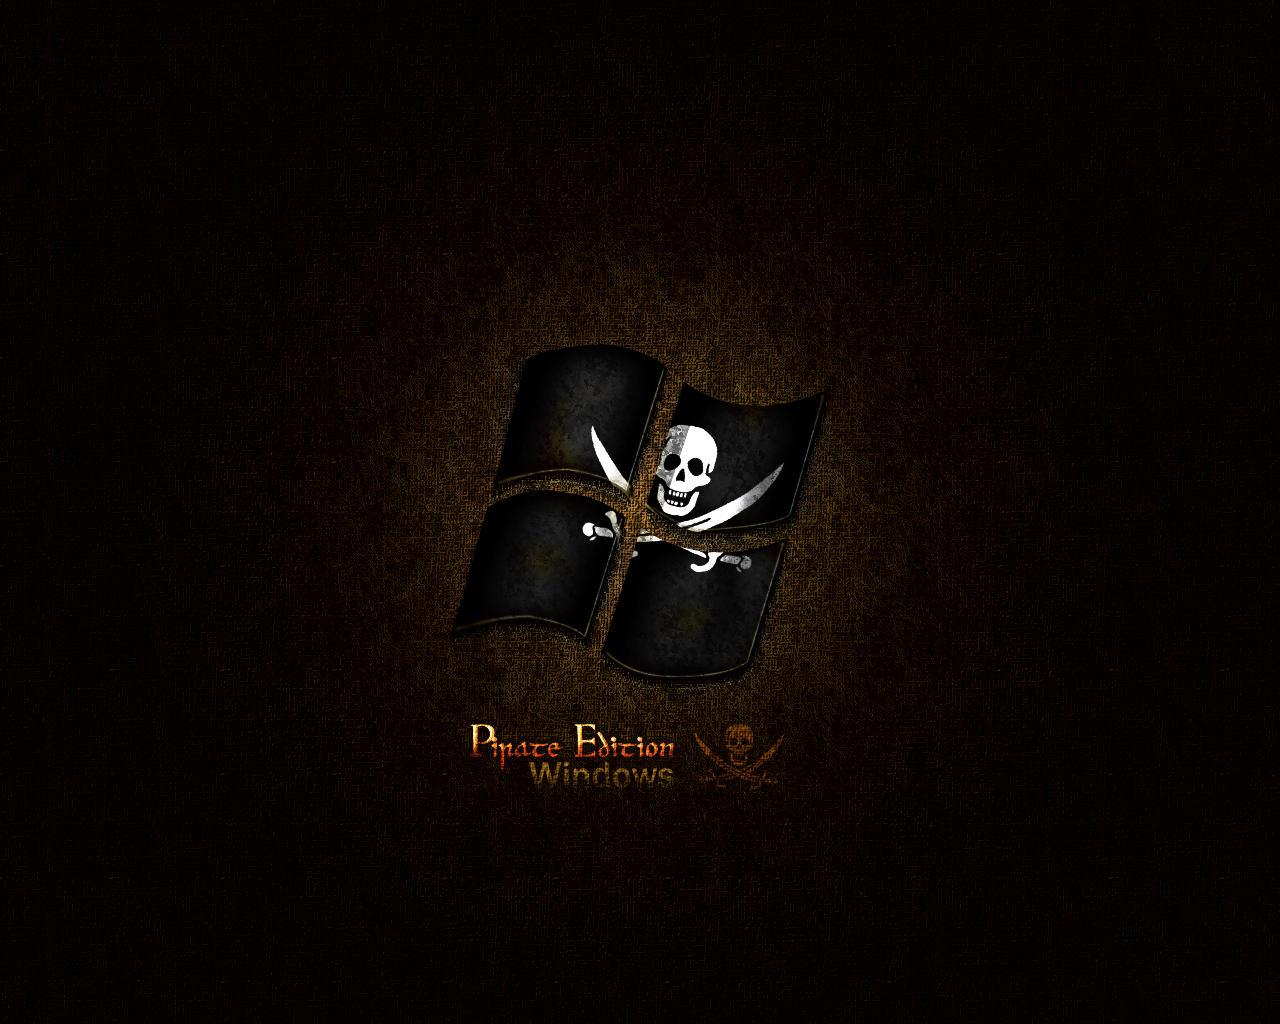 windous xp pirata: